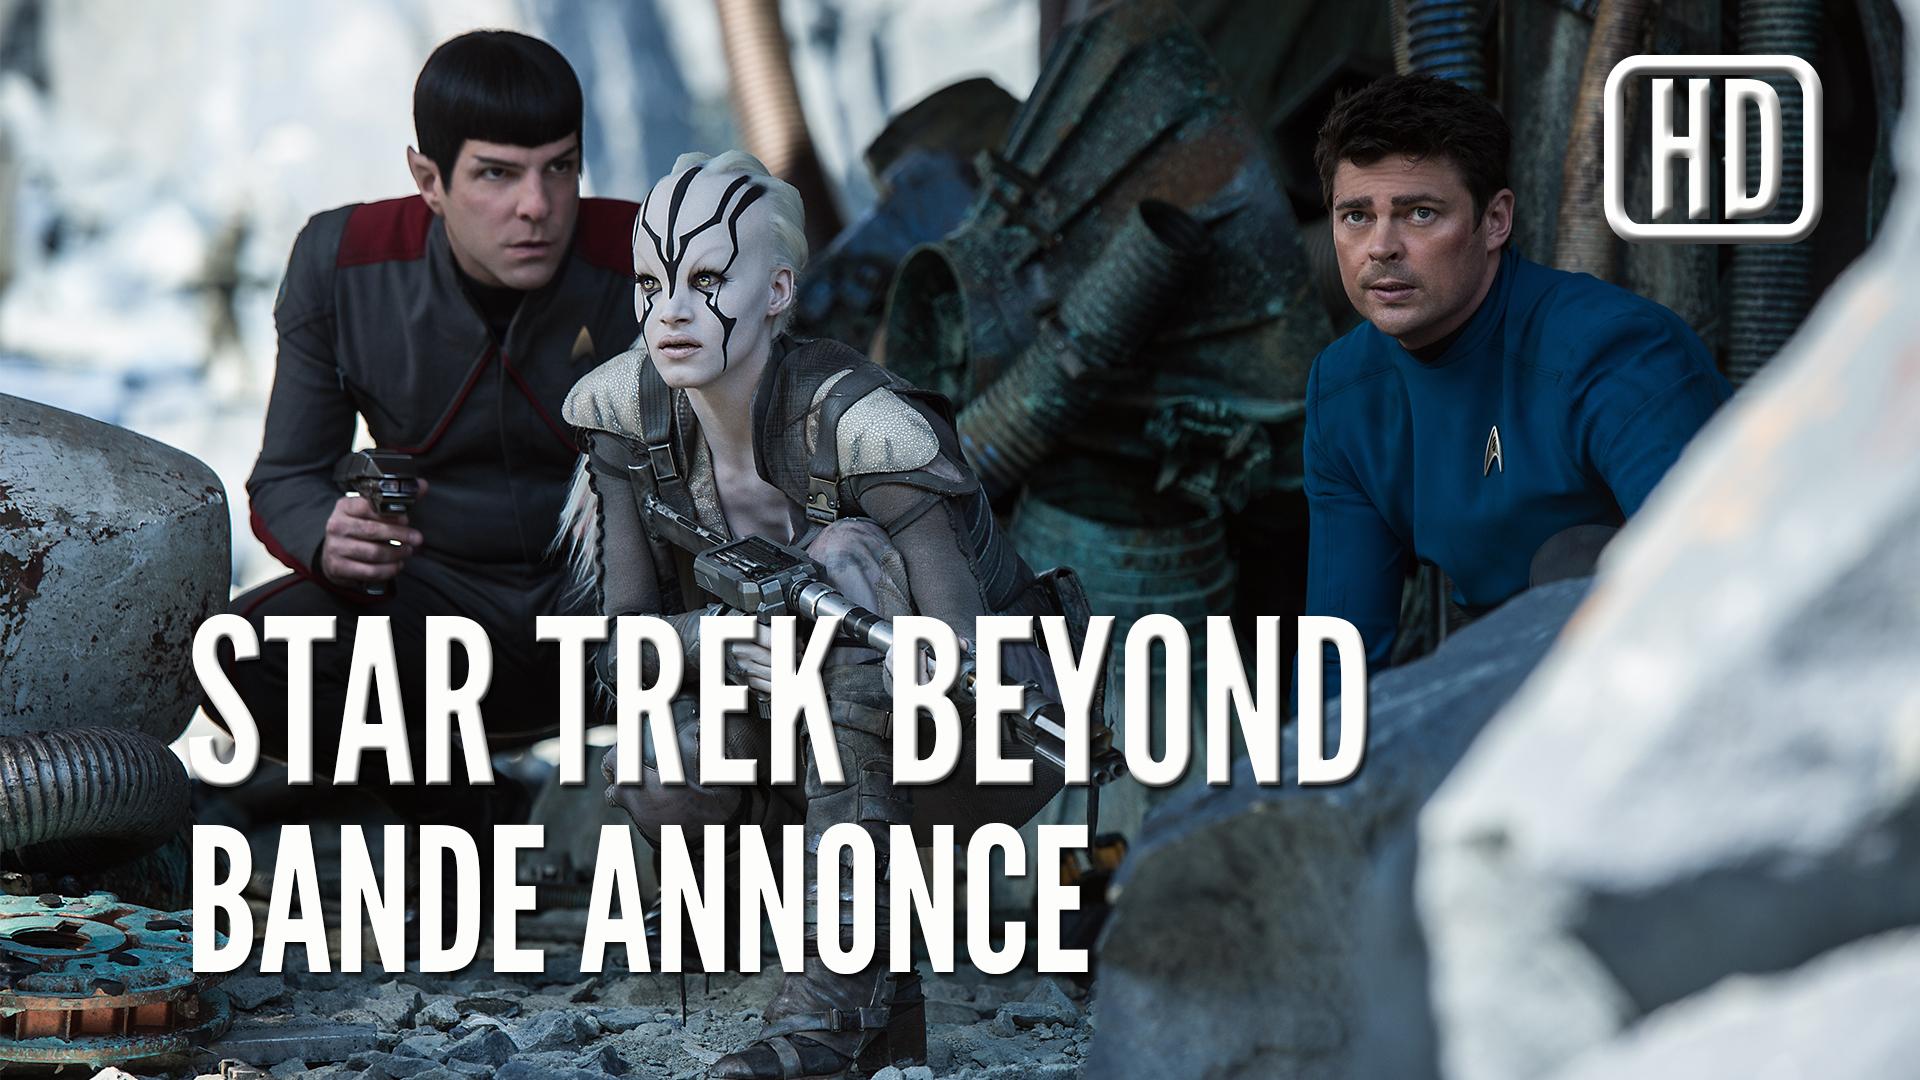 Star Trek Beyond (Sans Limites), la Bande Annonce